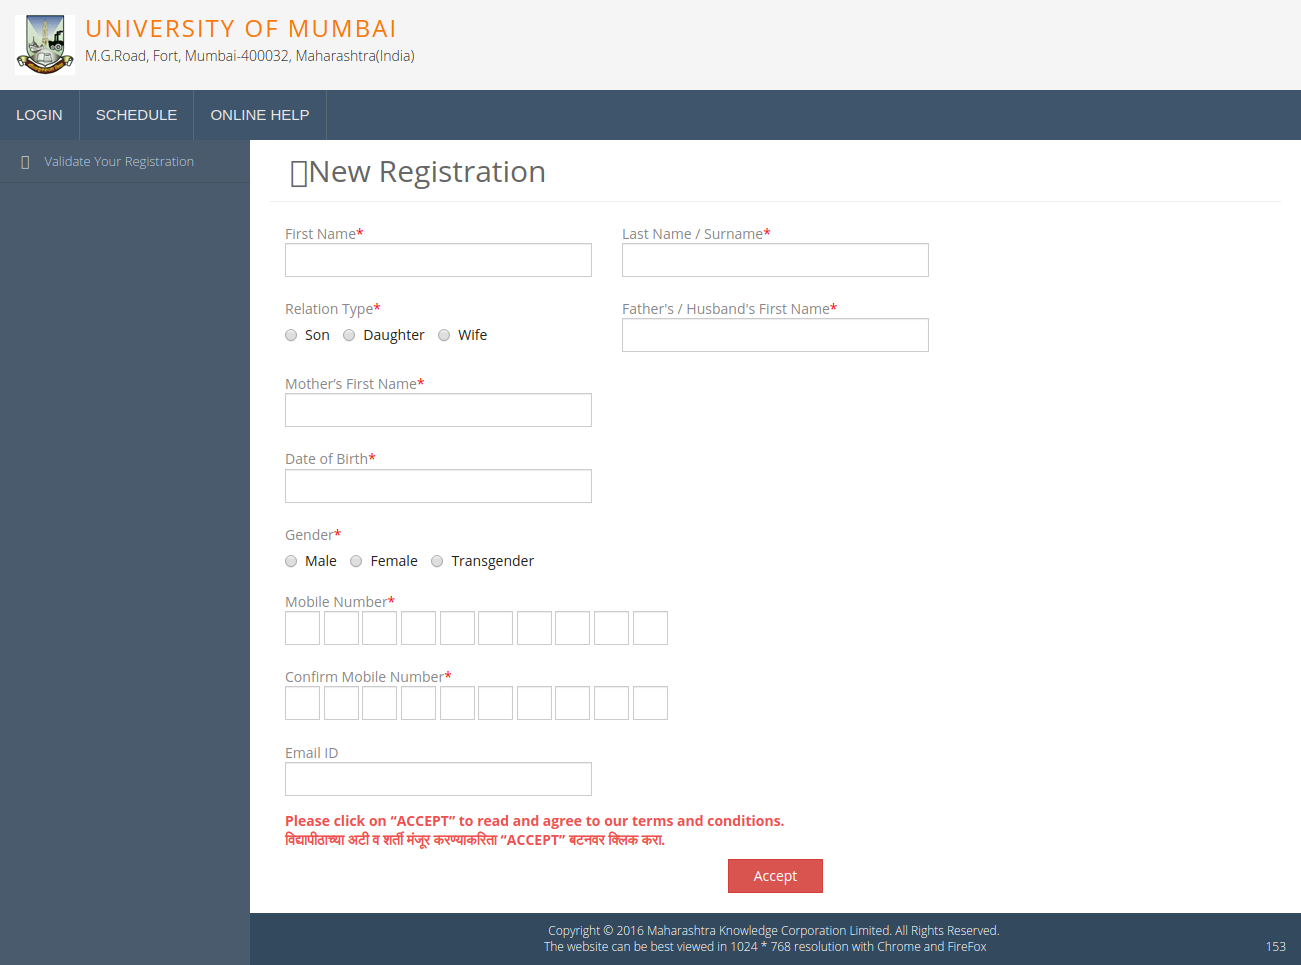 Mumbai University Admission Form 2019 (Released) - Registration Process